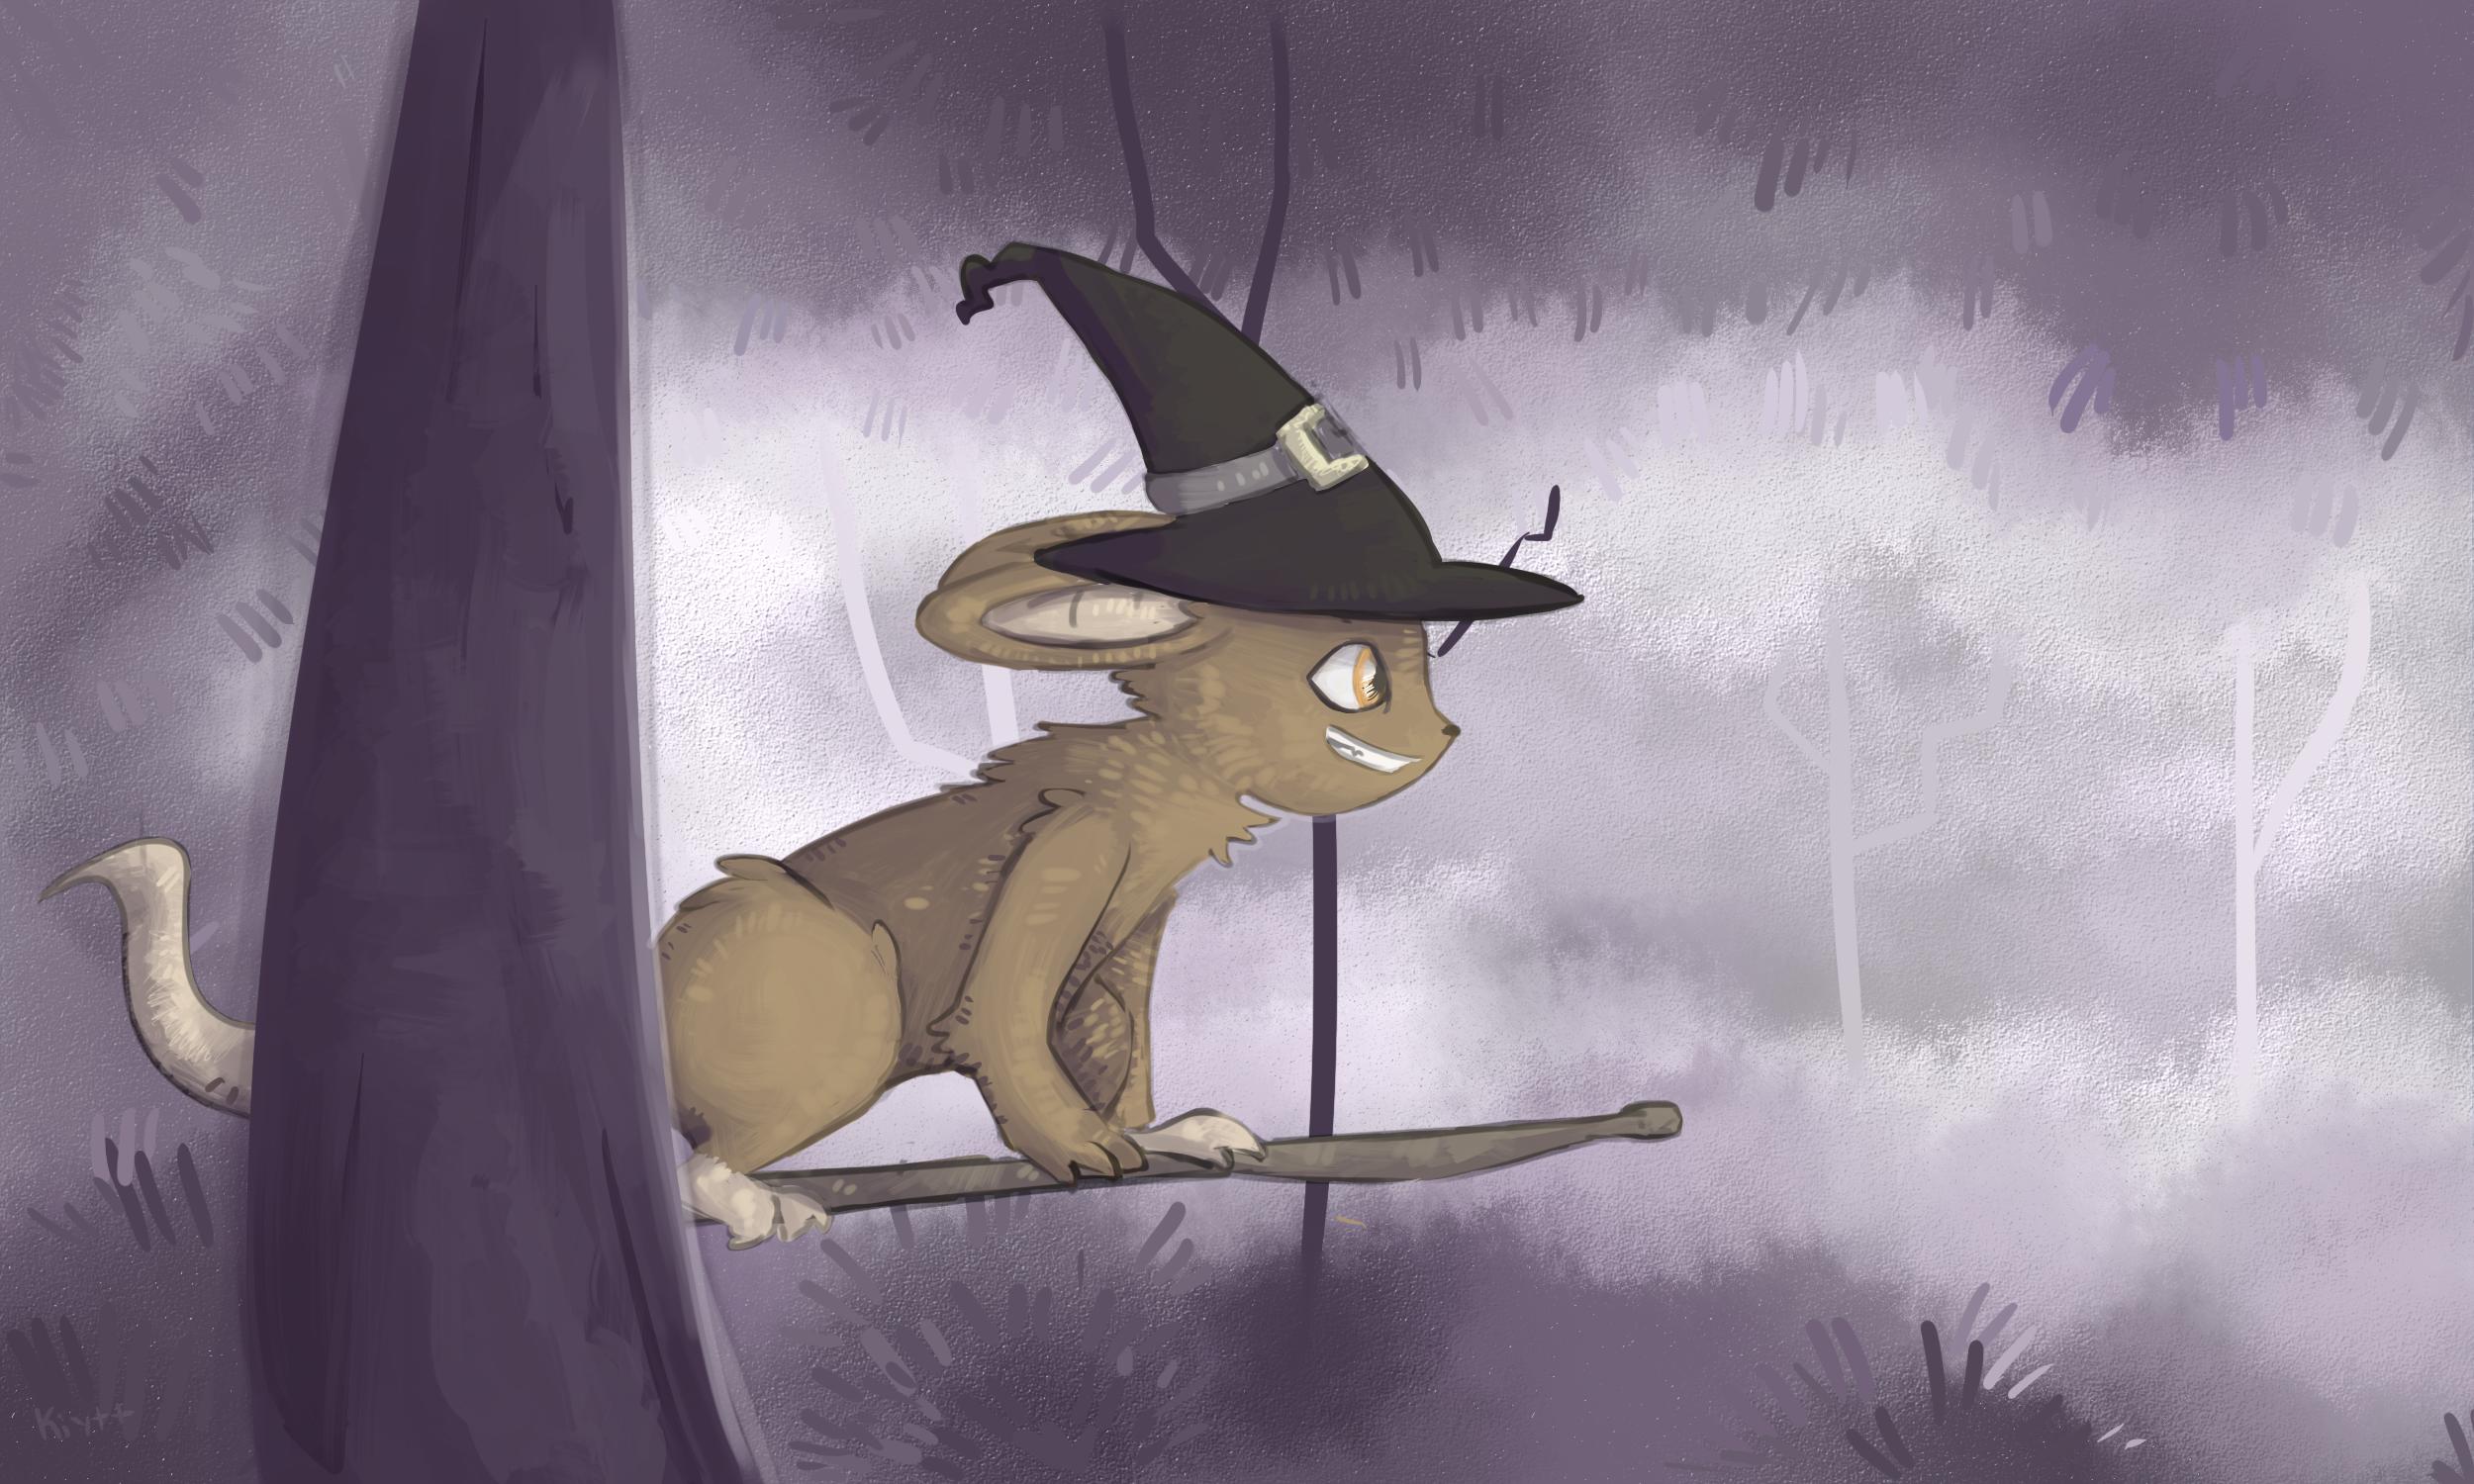 Spooky Forest by Kiytt